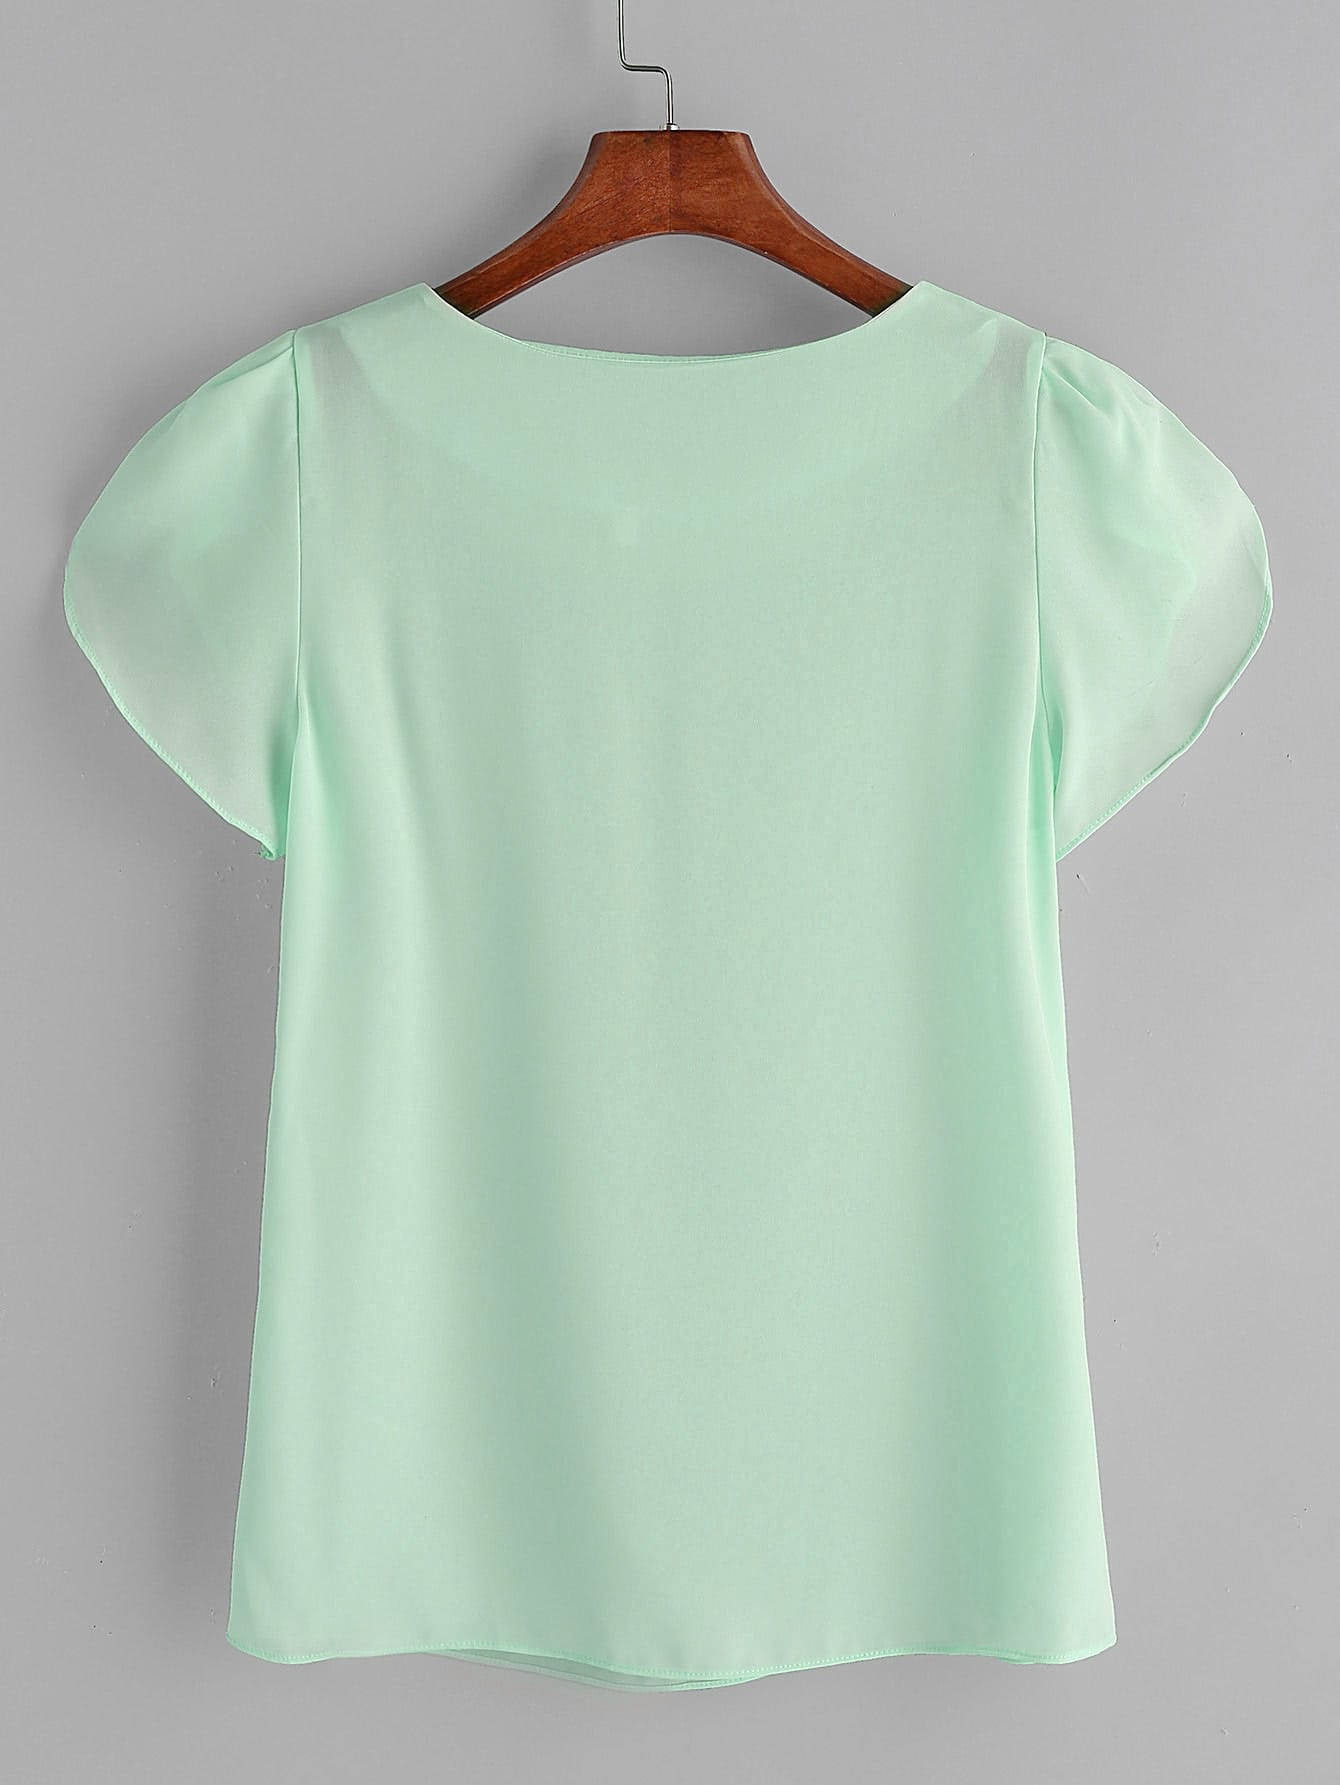 blouse170503101_2